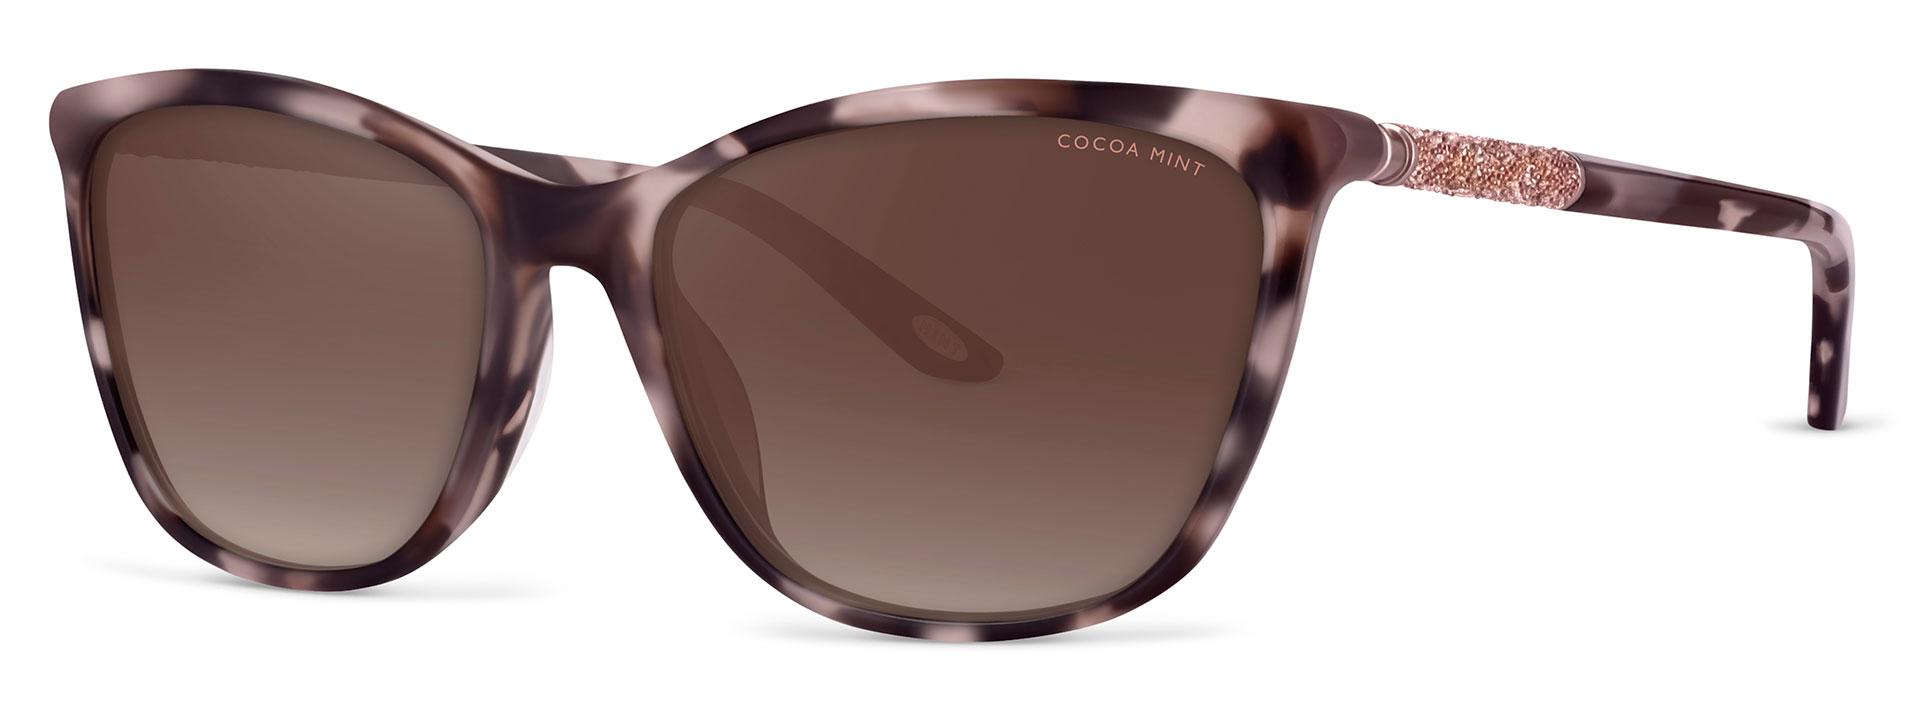 Cocoa Mint Sun Glasses - Rose Tortoiseshell - CMS2066-C1